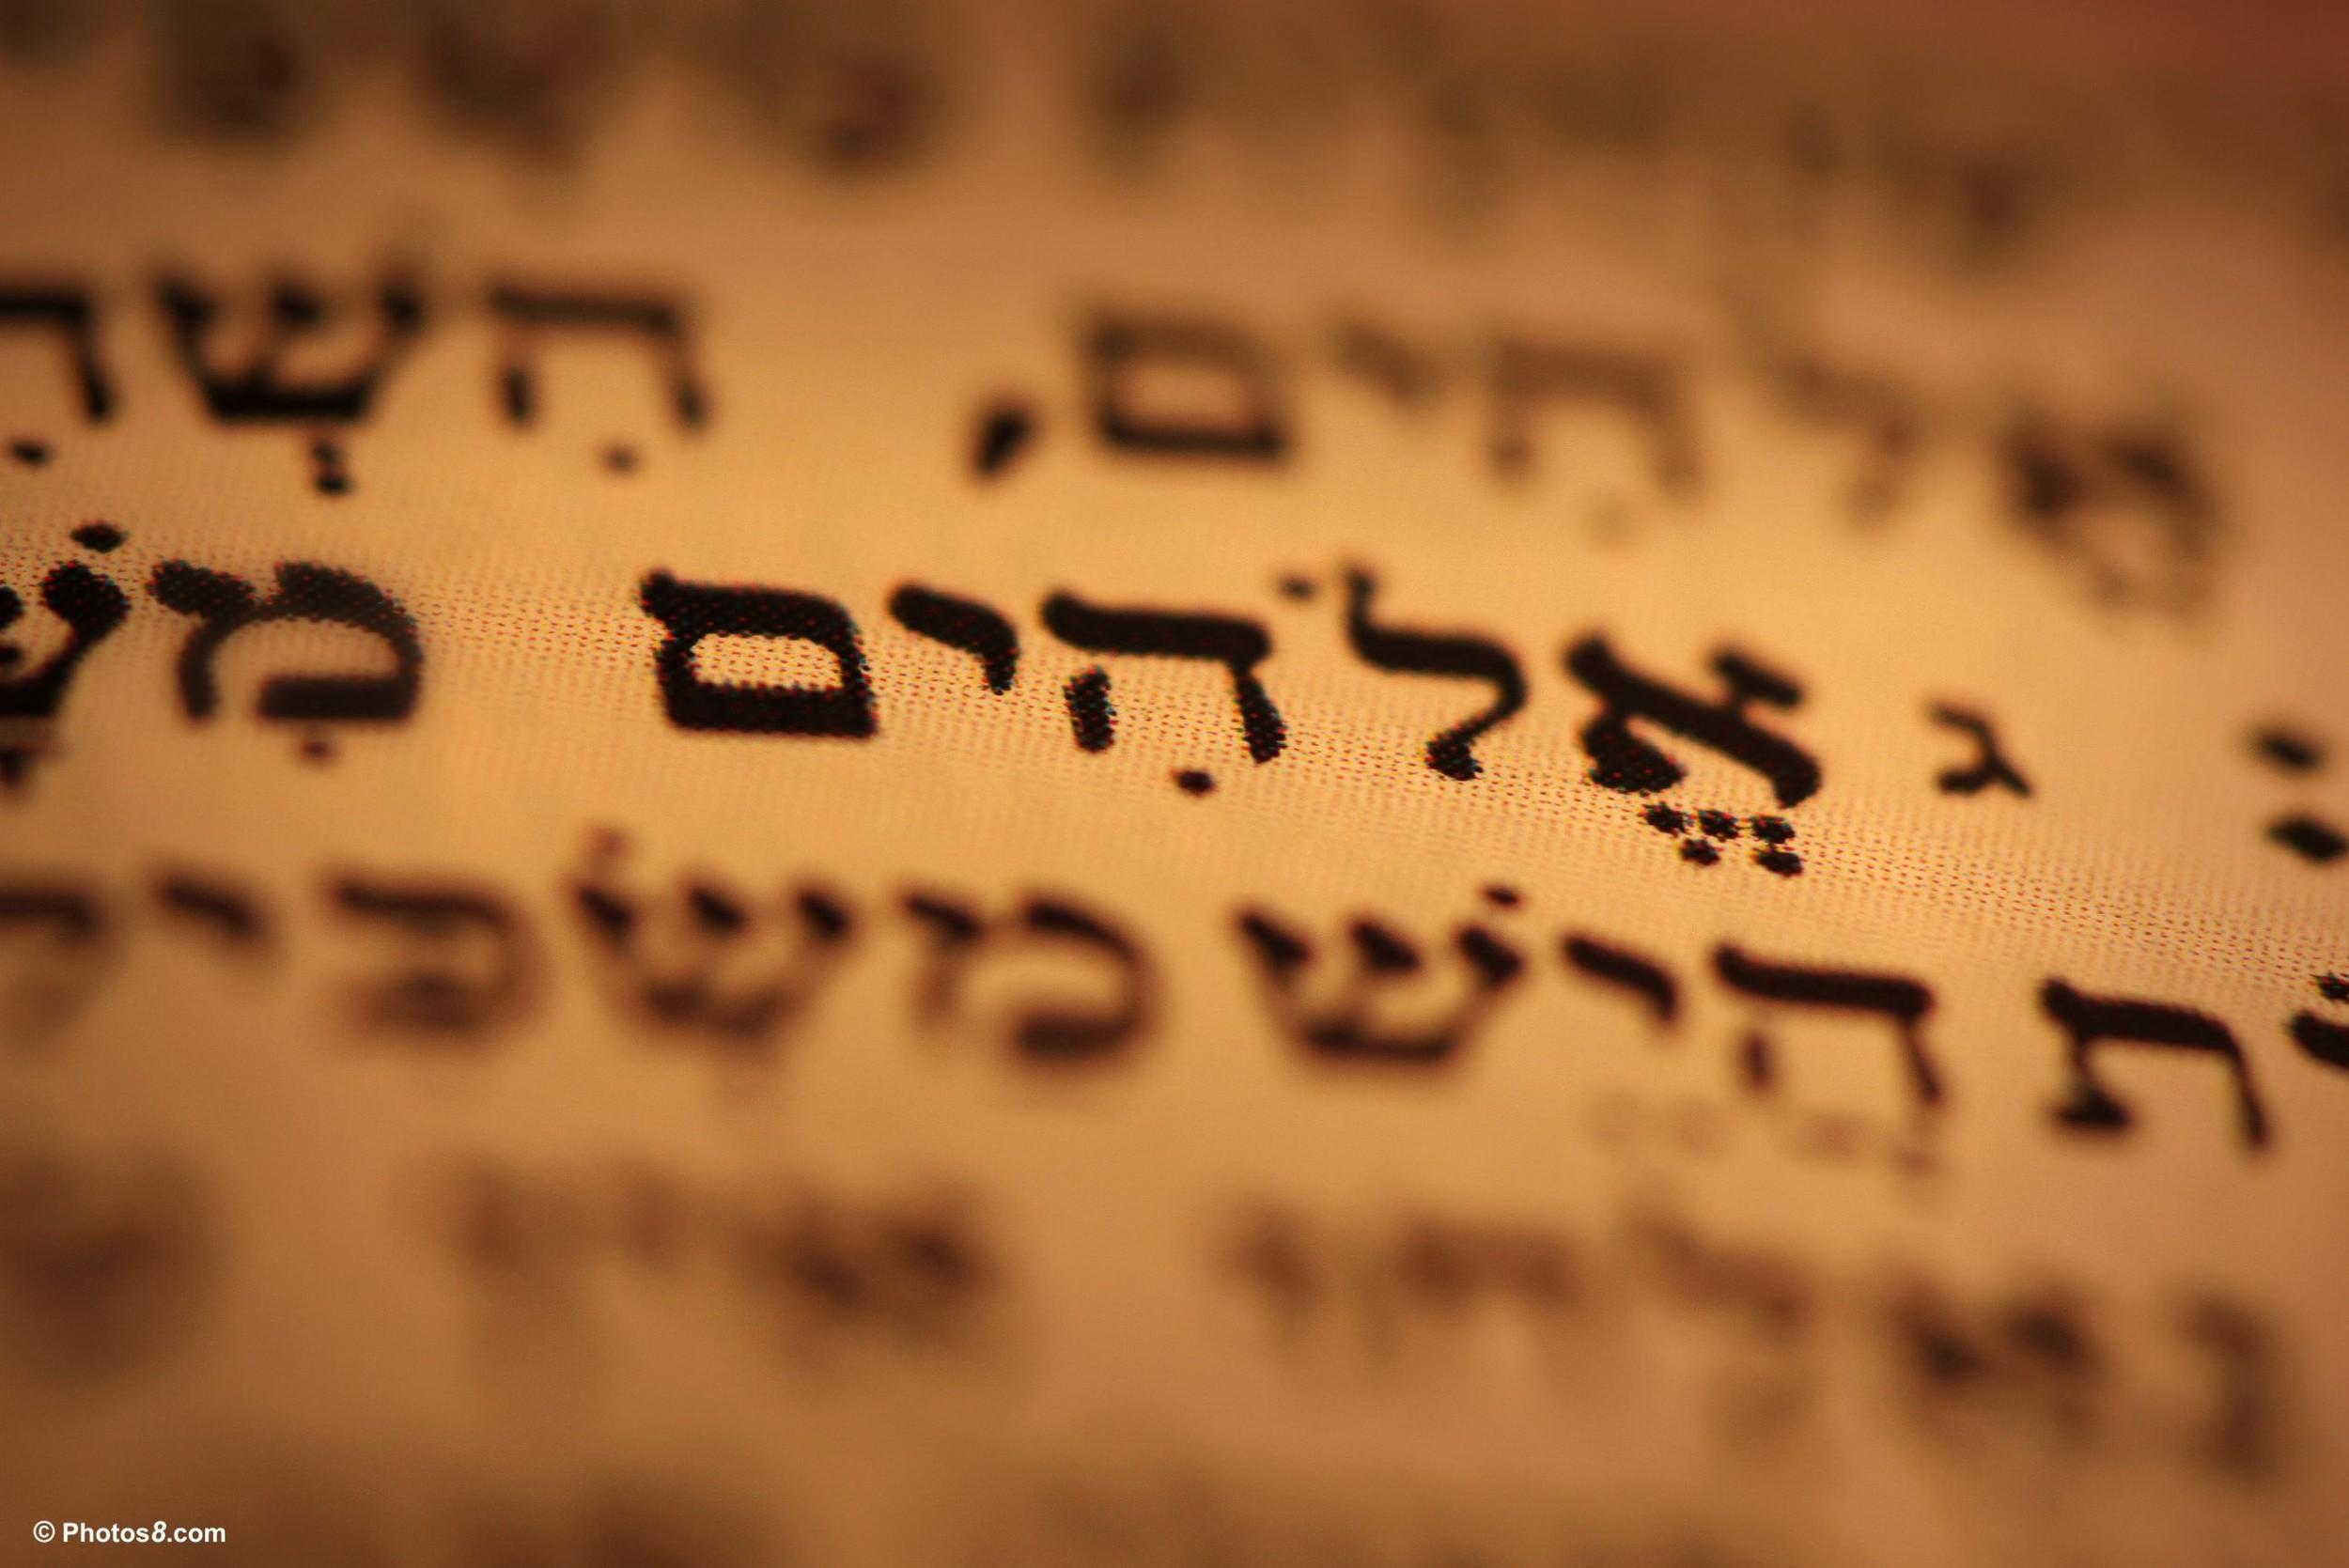 elohim-god-name-in-hebrew-torah-and-bible